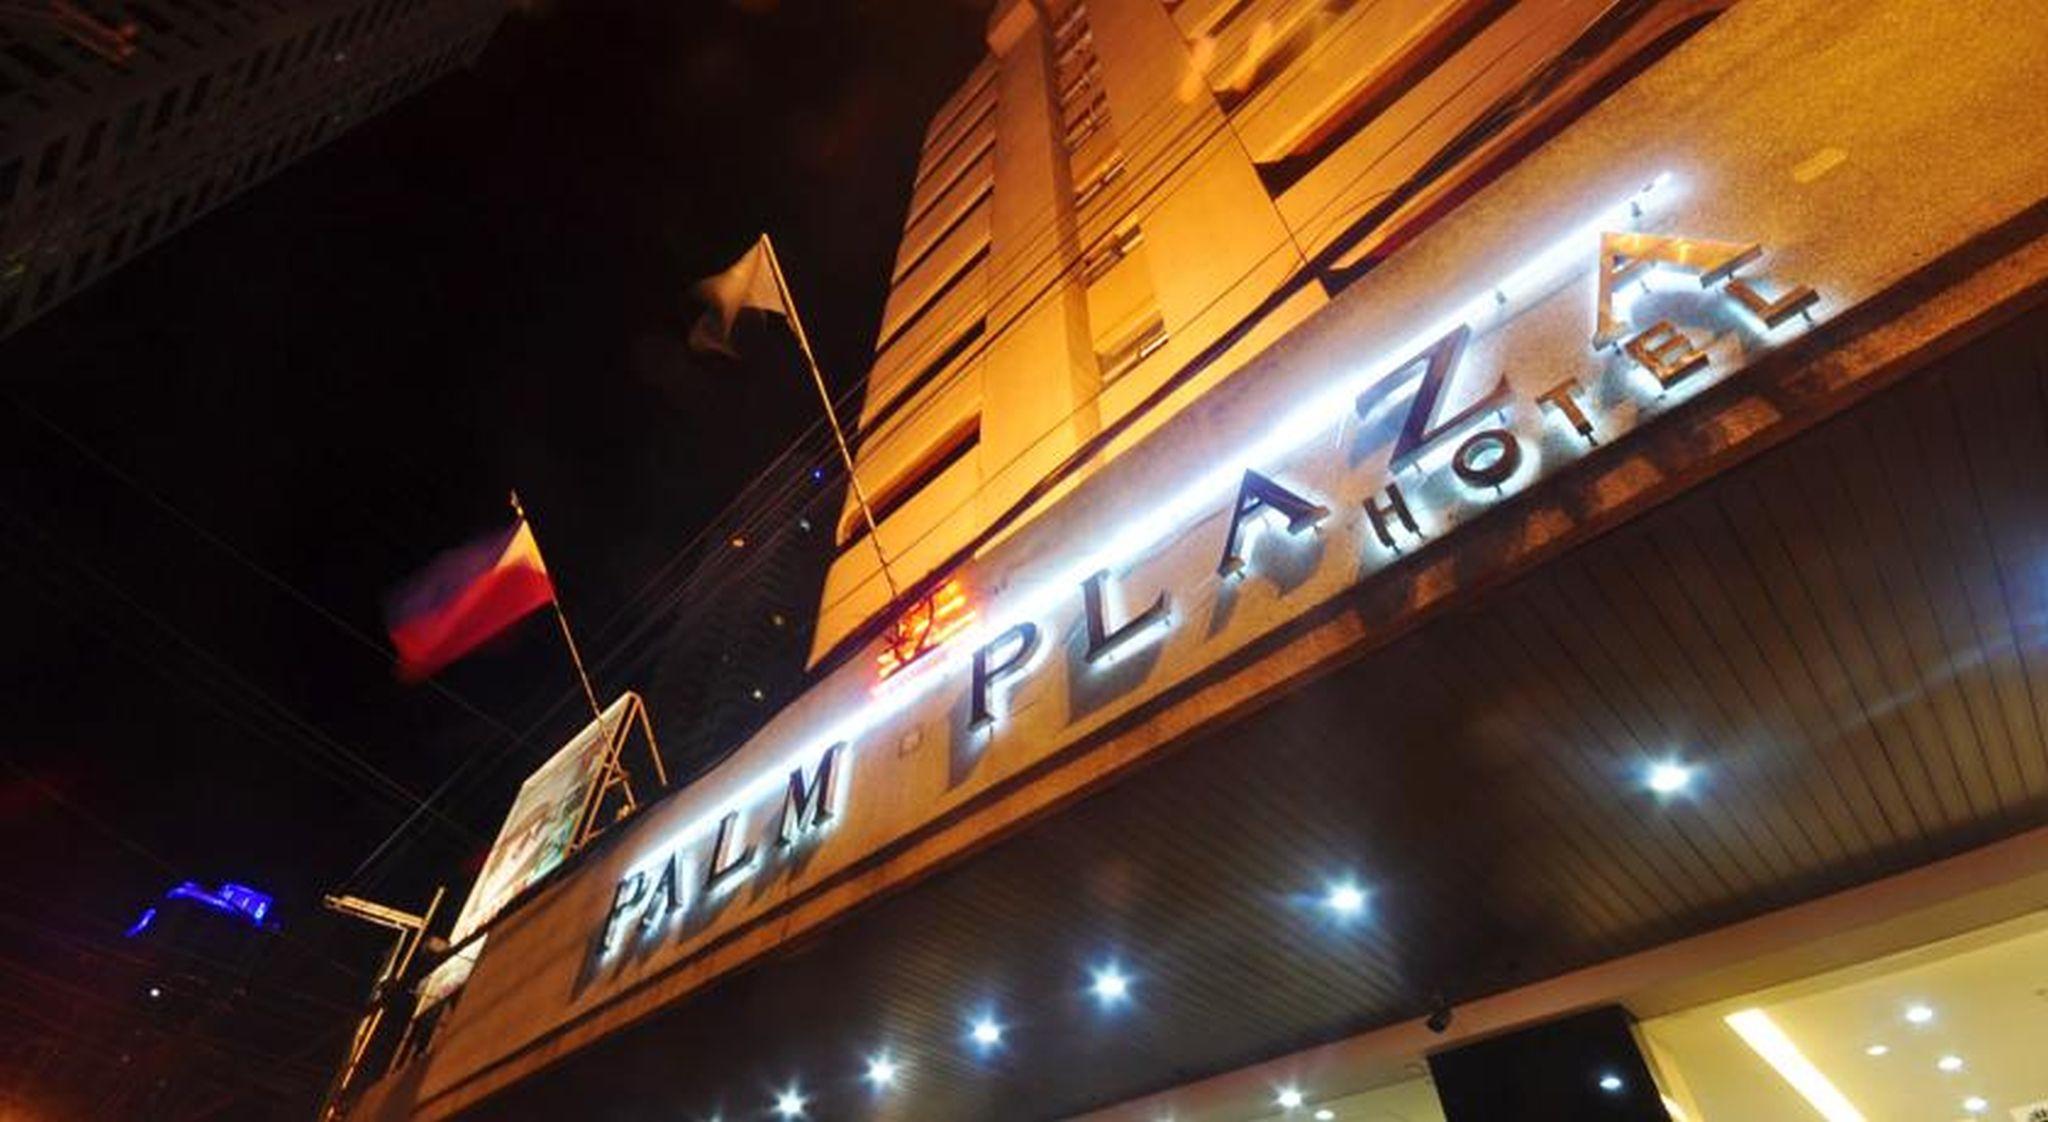 Palm Hotel (formerly known Palm Grove Hotel), Manila